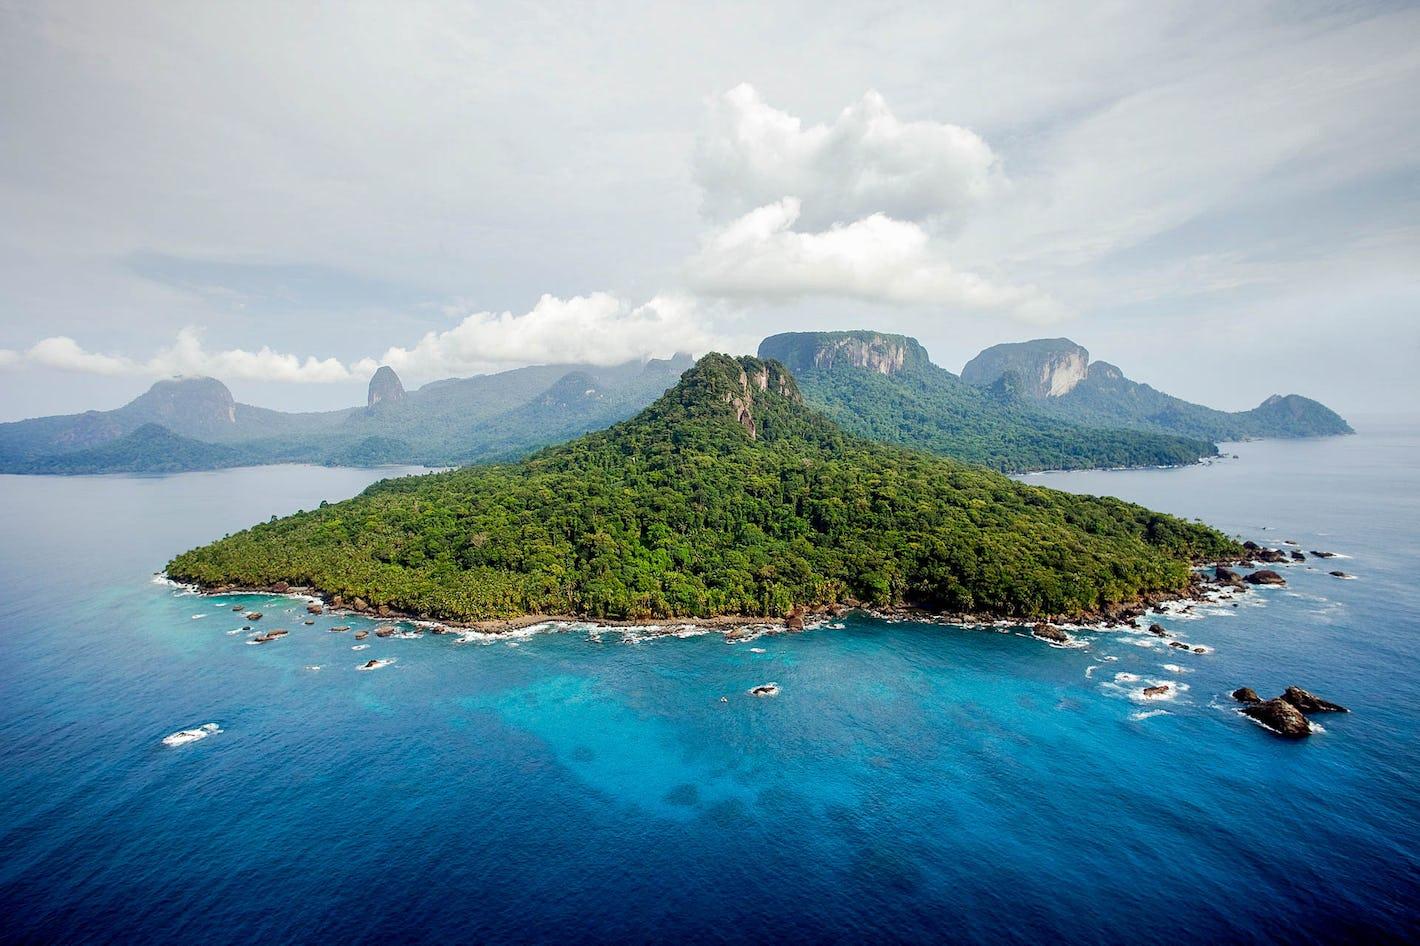 praia sundy principe island